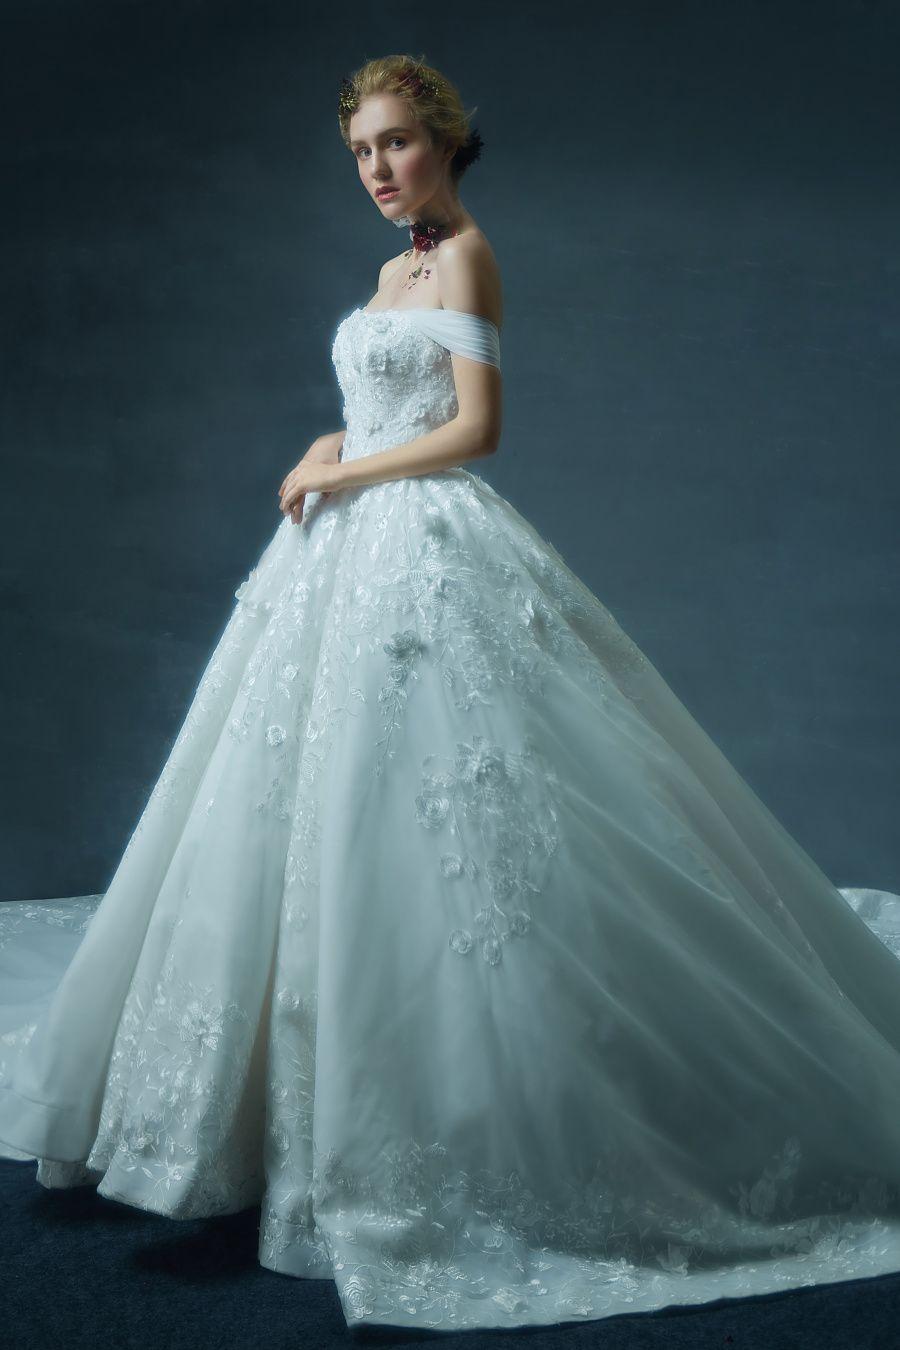 Dorable Katharine Hepburn Wedding Dress Mold - All Wedding Dresses ...